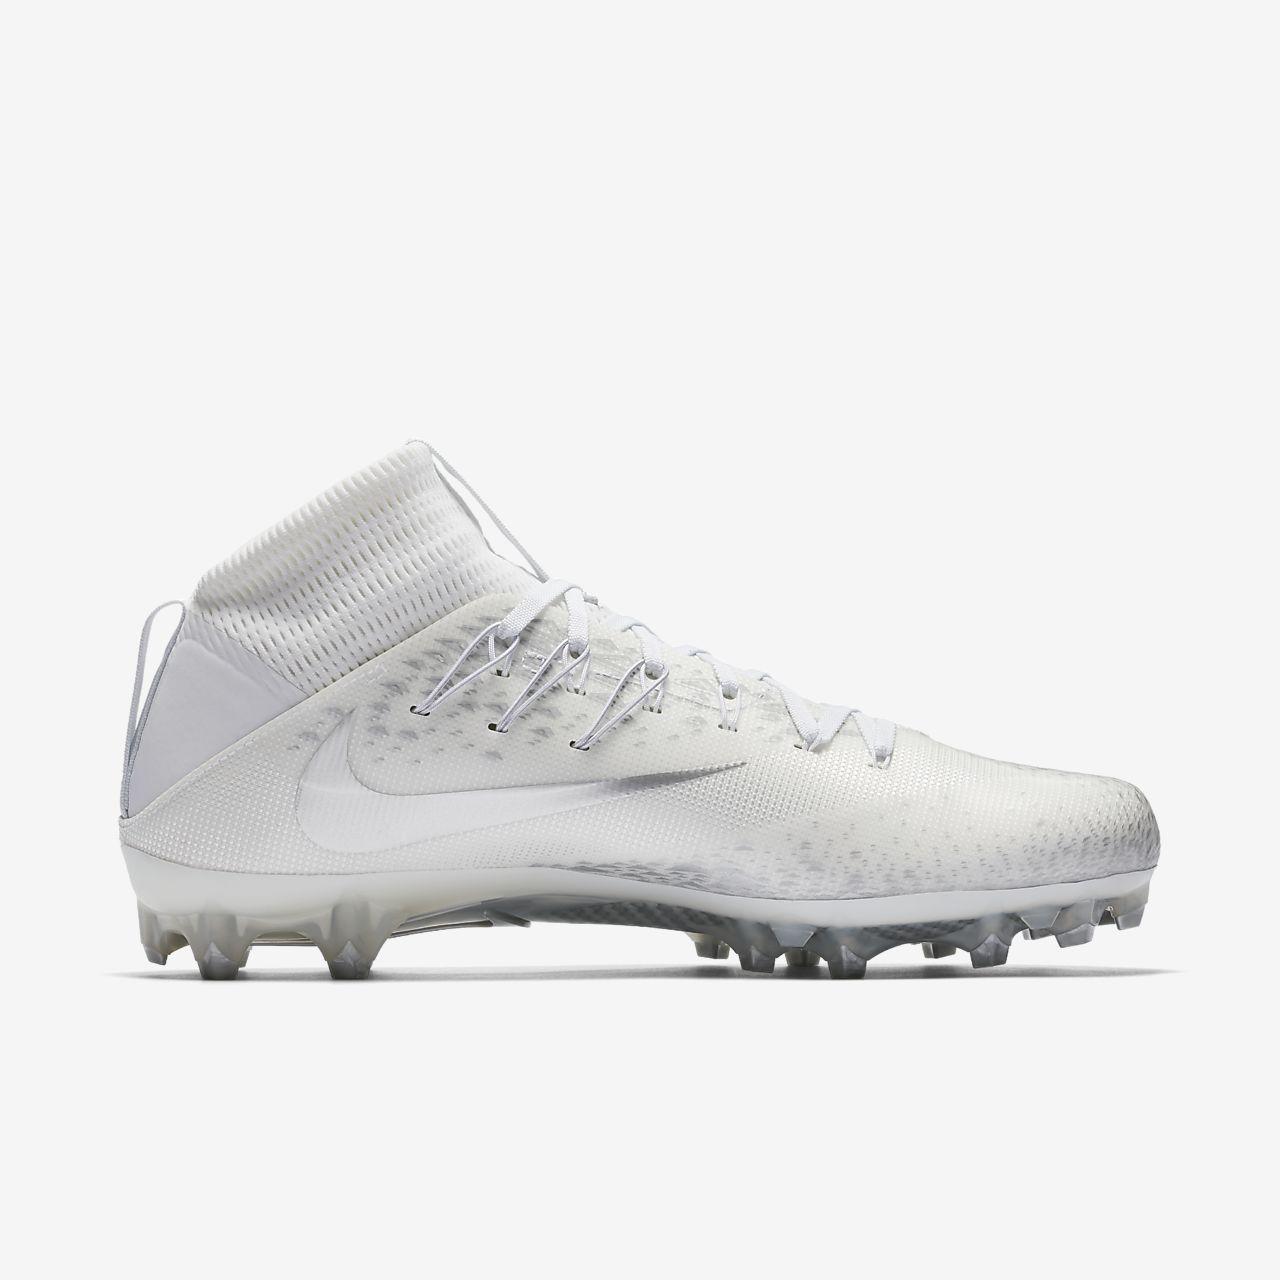 ... Nike Vapor Untouchable 2 Men\u0027s Football Cleat